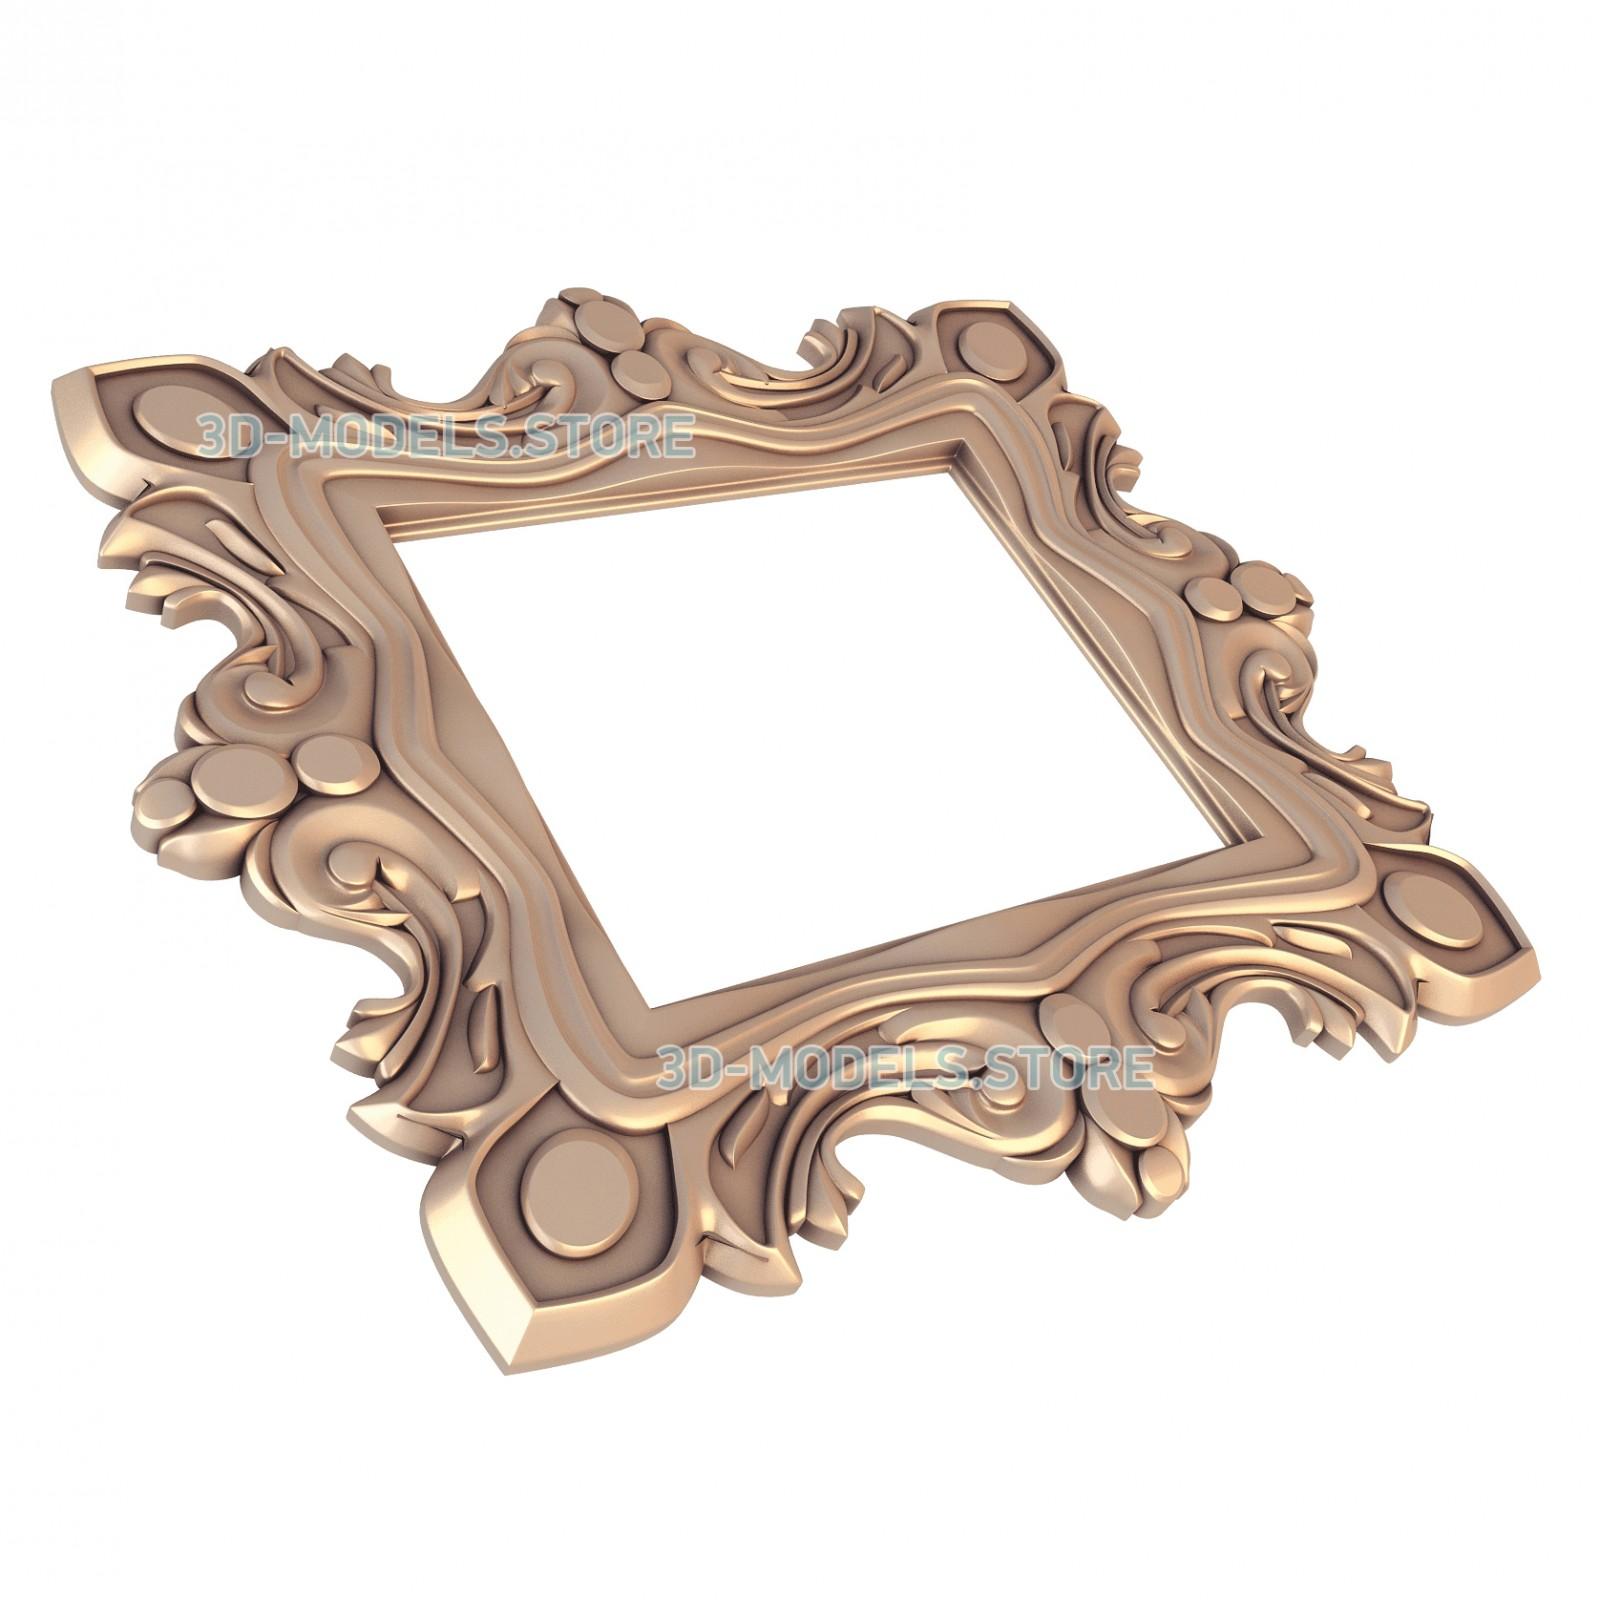 Frame rm_stl_0015 - 3D (stl) model